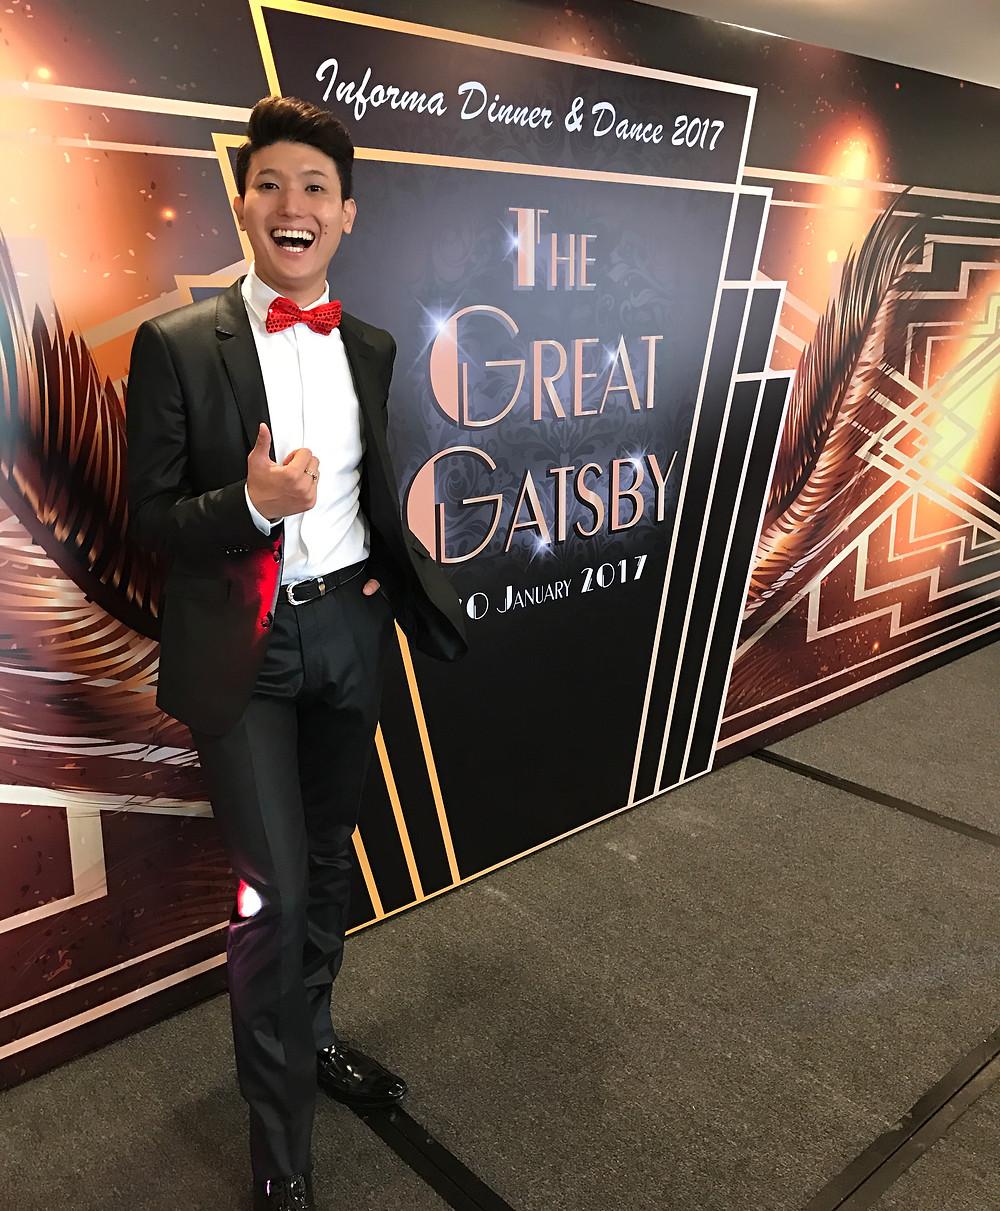 Emcee Singapore - Ainsley Chong, Informa Dinner & Dance 2017